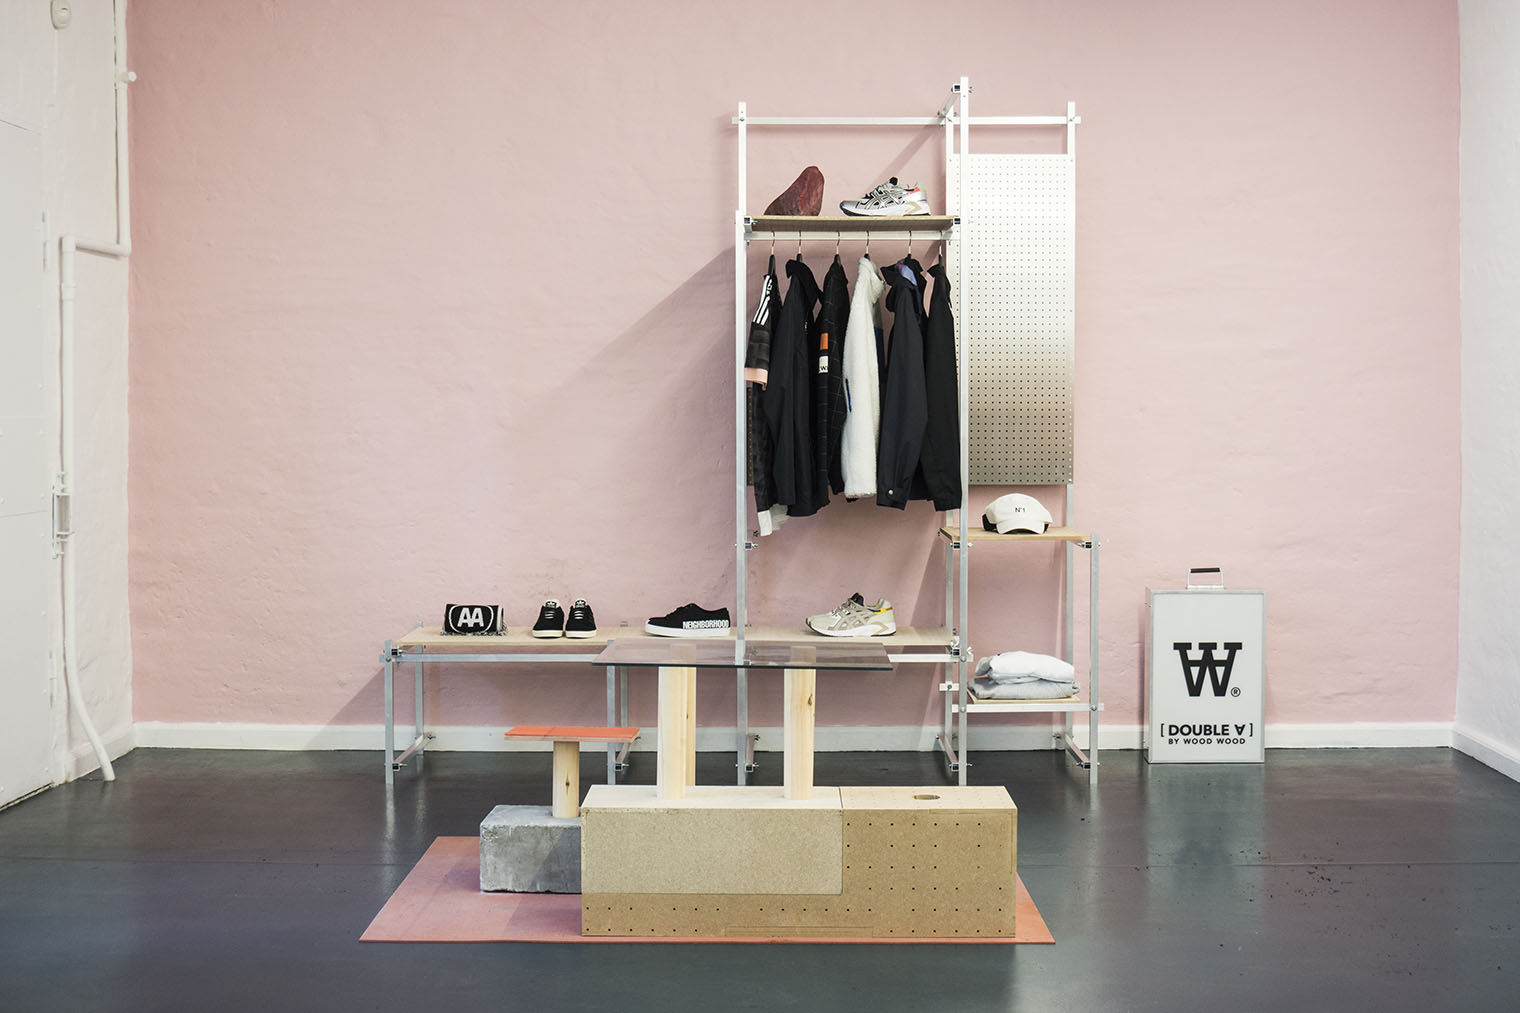 Muebles Escaparate : Muebles modulares que se adaptan a la ropa diariodesign